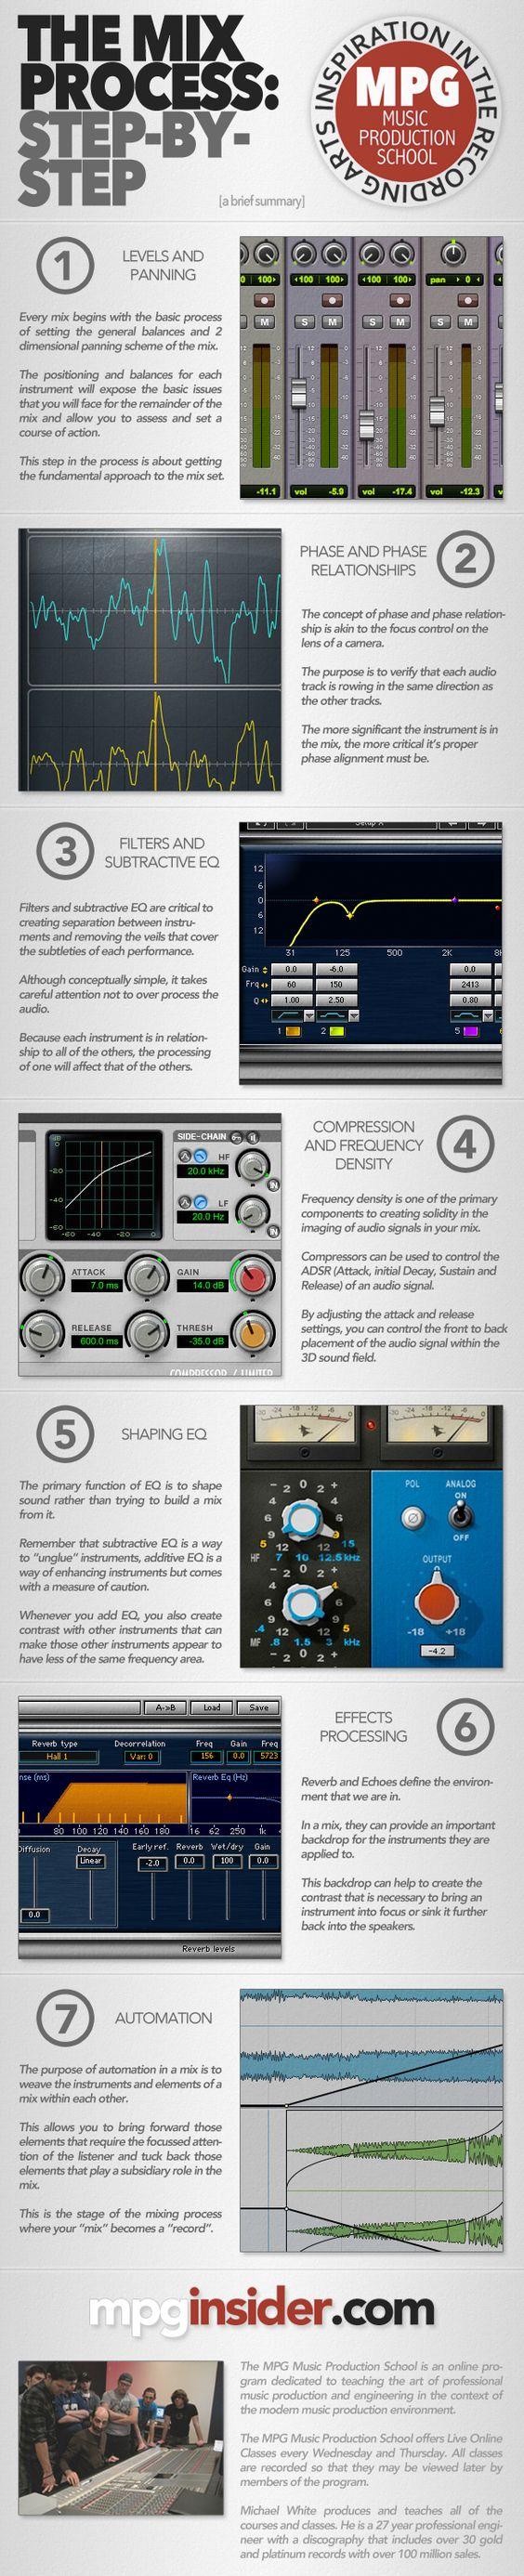 mixing-process